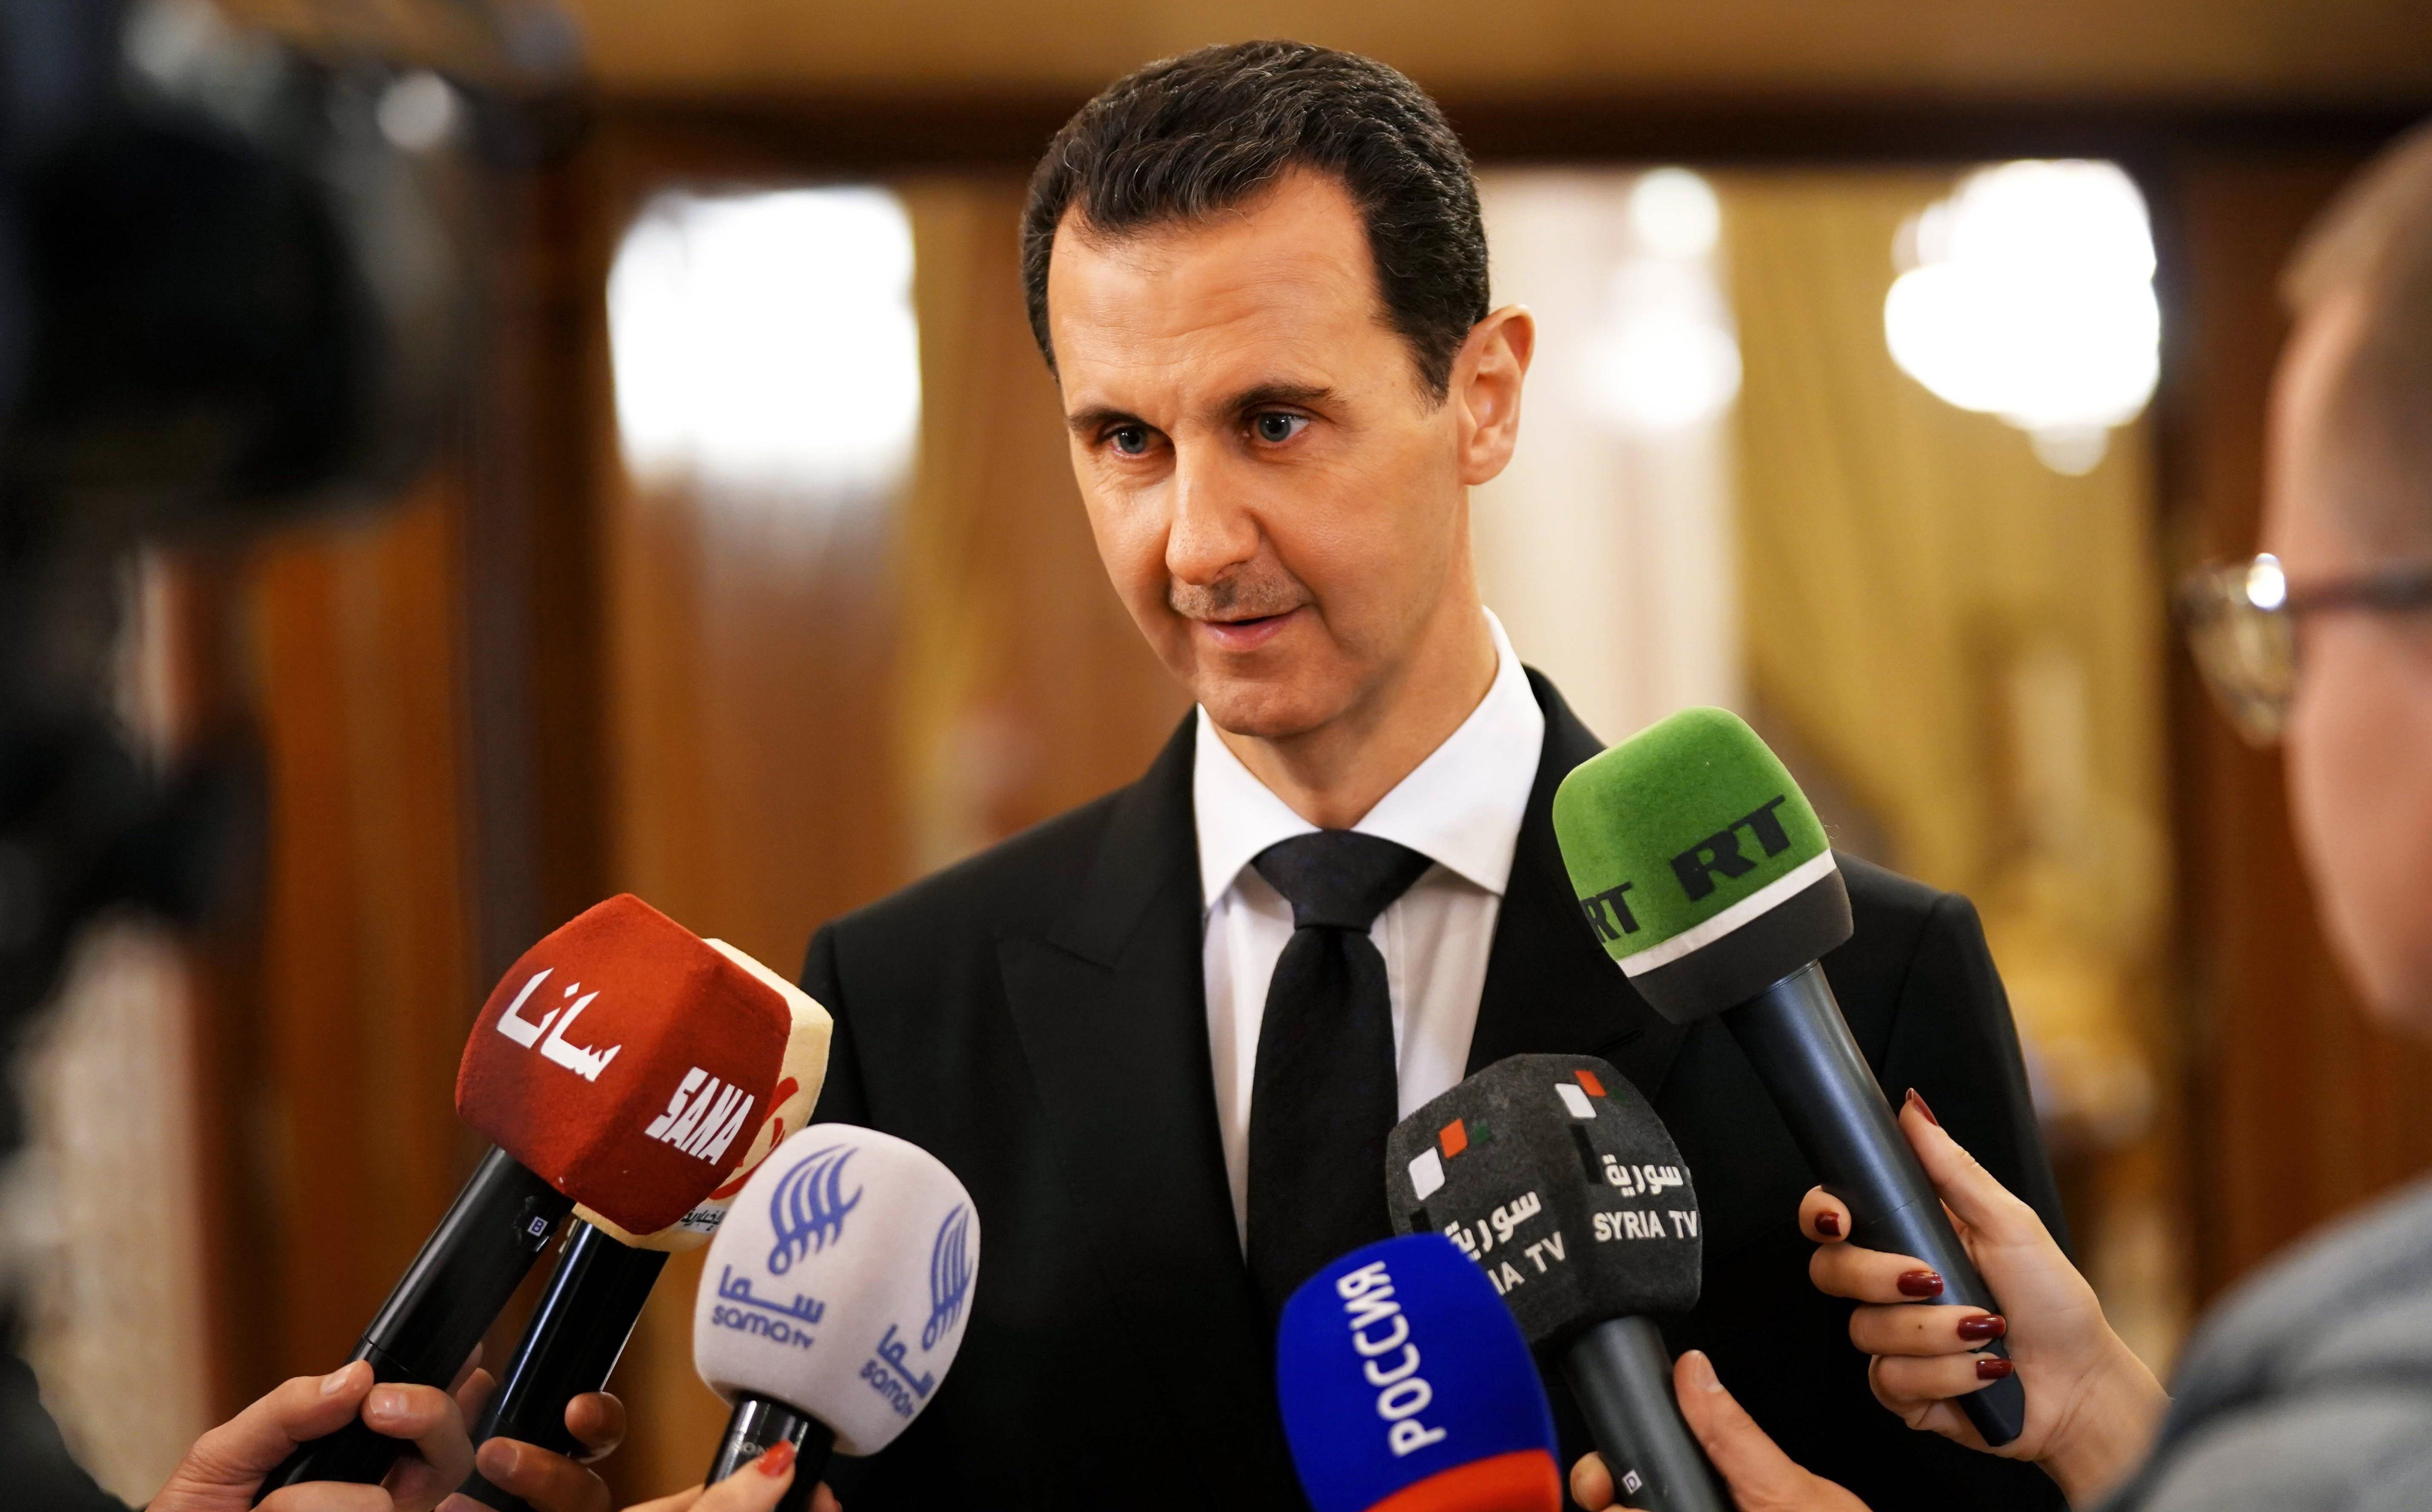 Syrian President Bashar al-Assad speaking to press in Damascus on Monday. Photo: AFP/HO/SANA